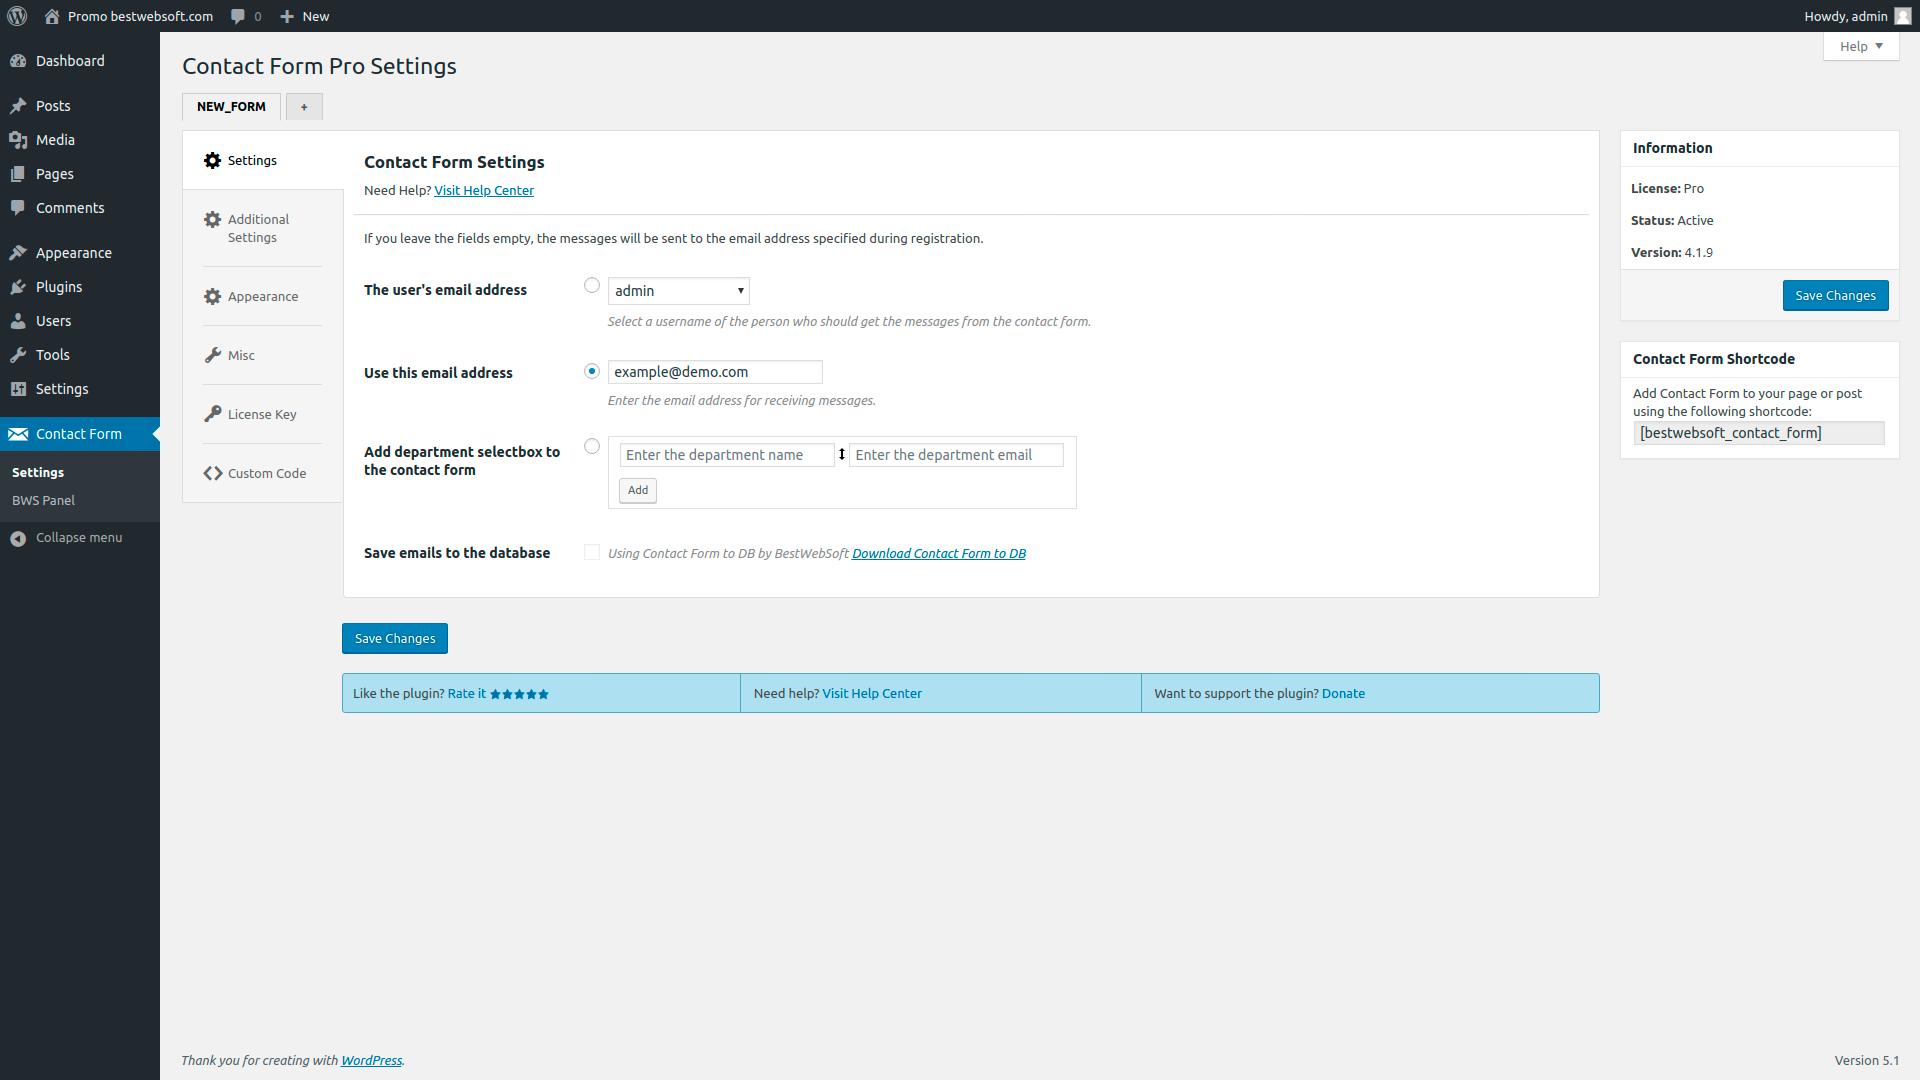 contact form screenshot 4